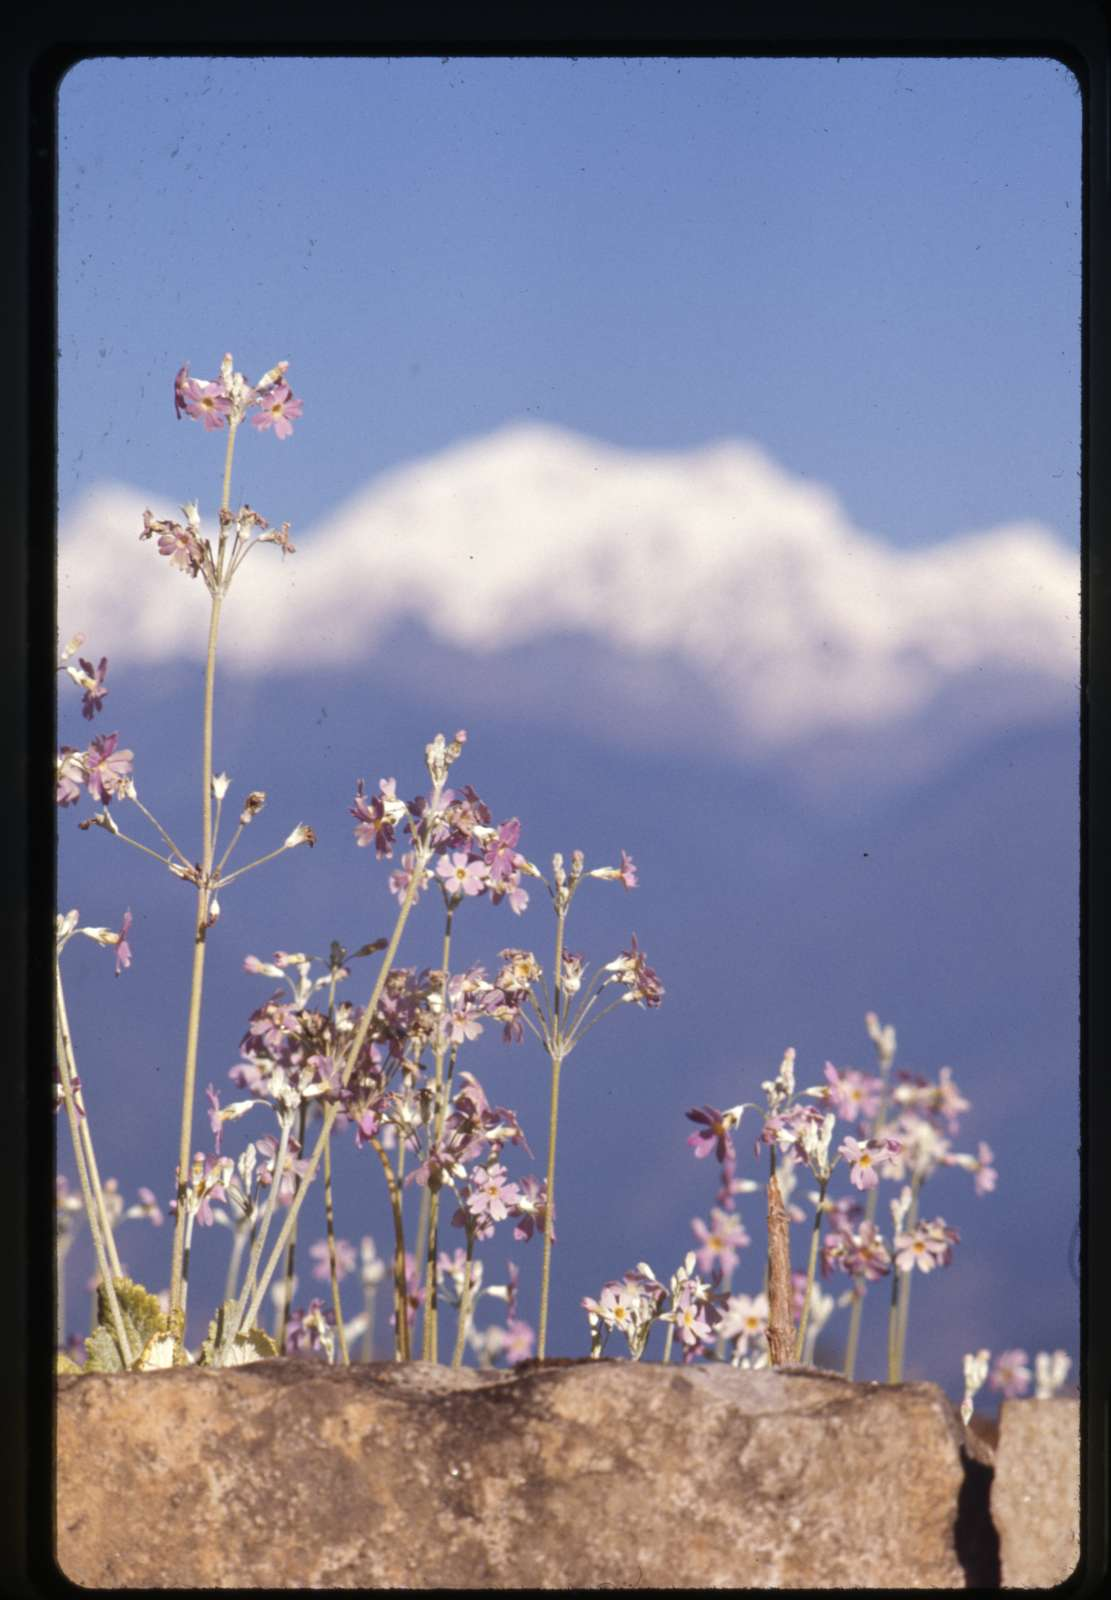 [Primula flowers at Pemayangtse in western Sikkim]